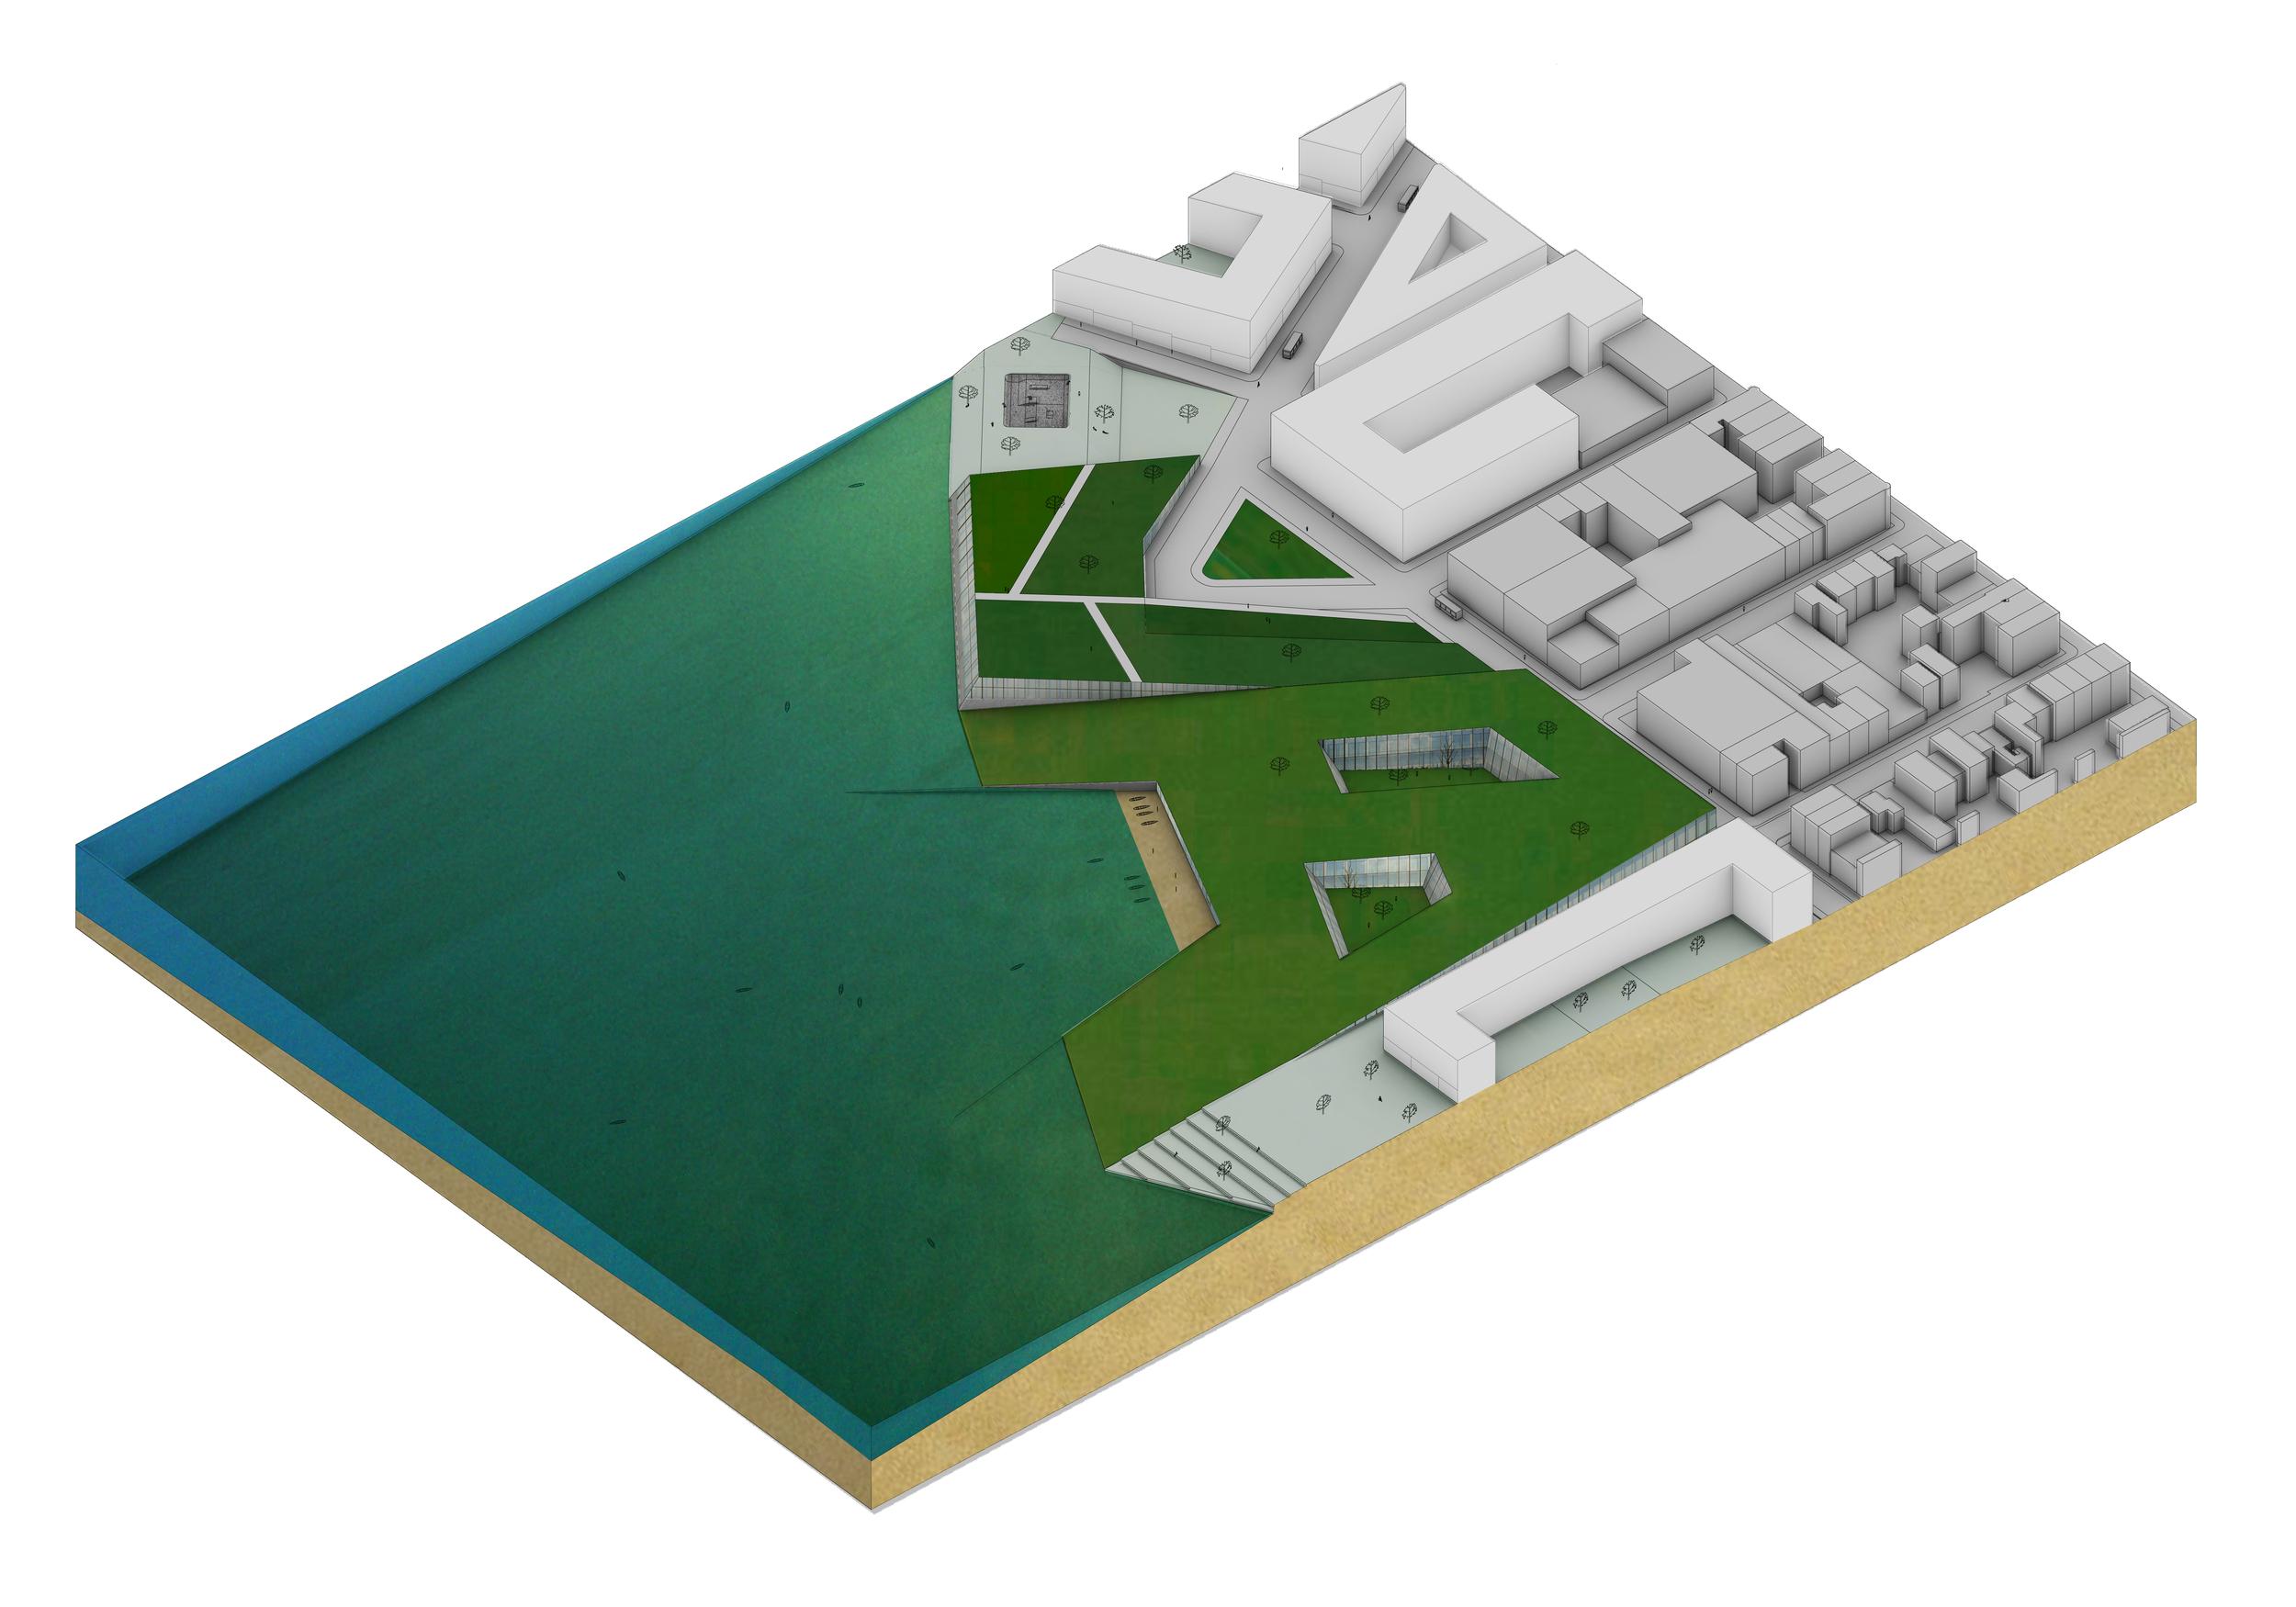 _maritime_boat_building_highschool-01 copy copy.jpg